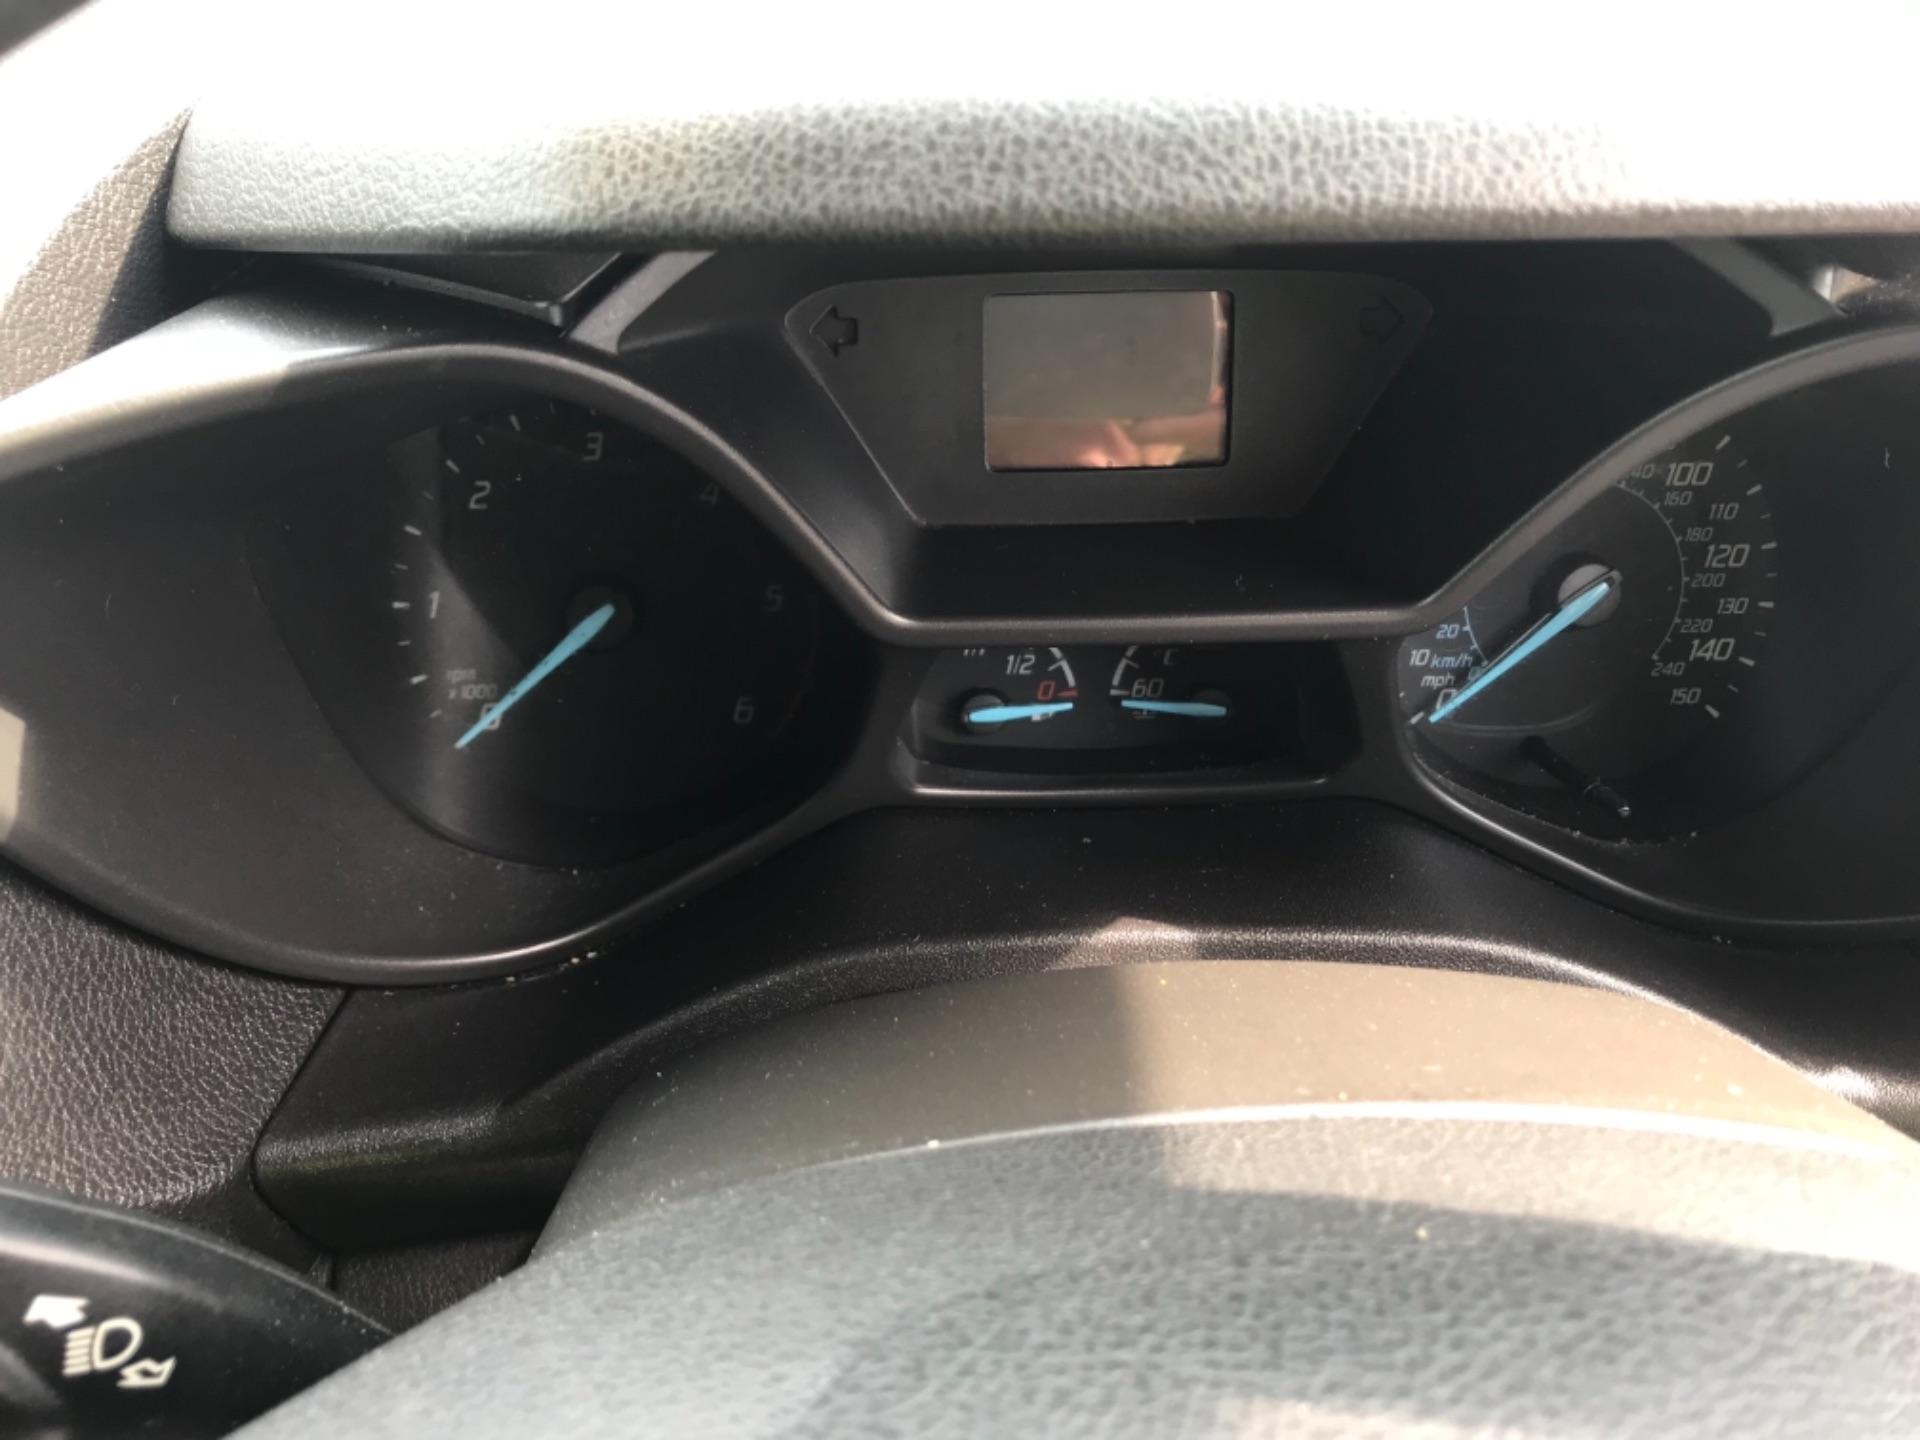 2016 Ford Transit Connect 1.5 Tdci 75Ps Van 200 L1 Diesel 1.5 TDCi 75PS Van EURO 6 (WM66XCW) Image 13